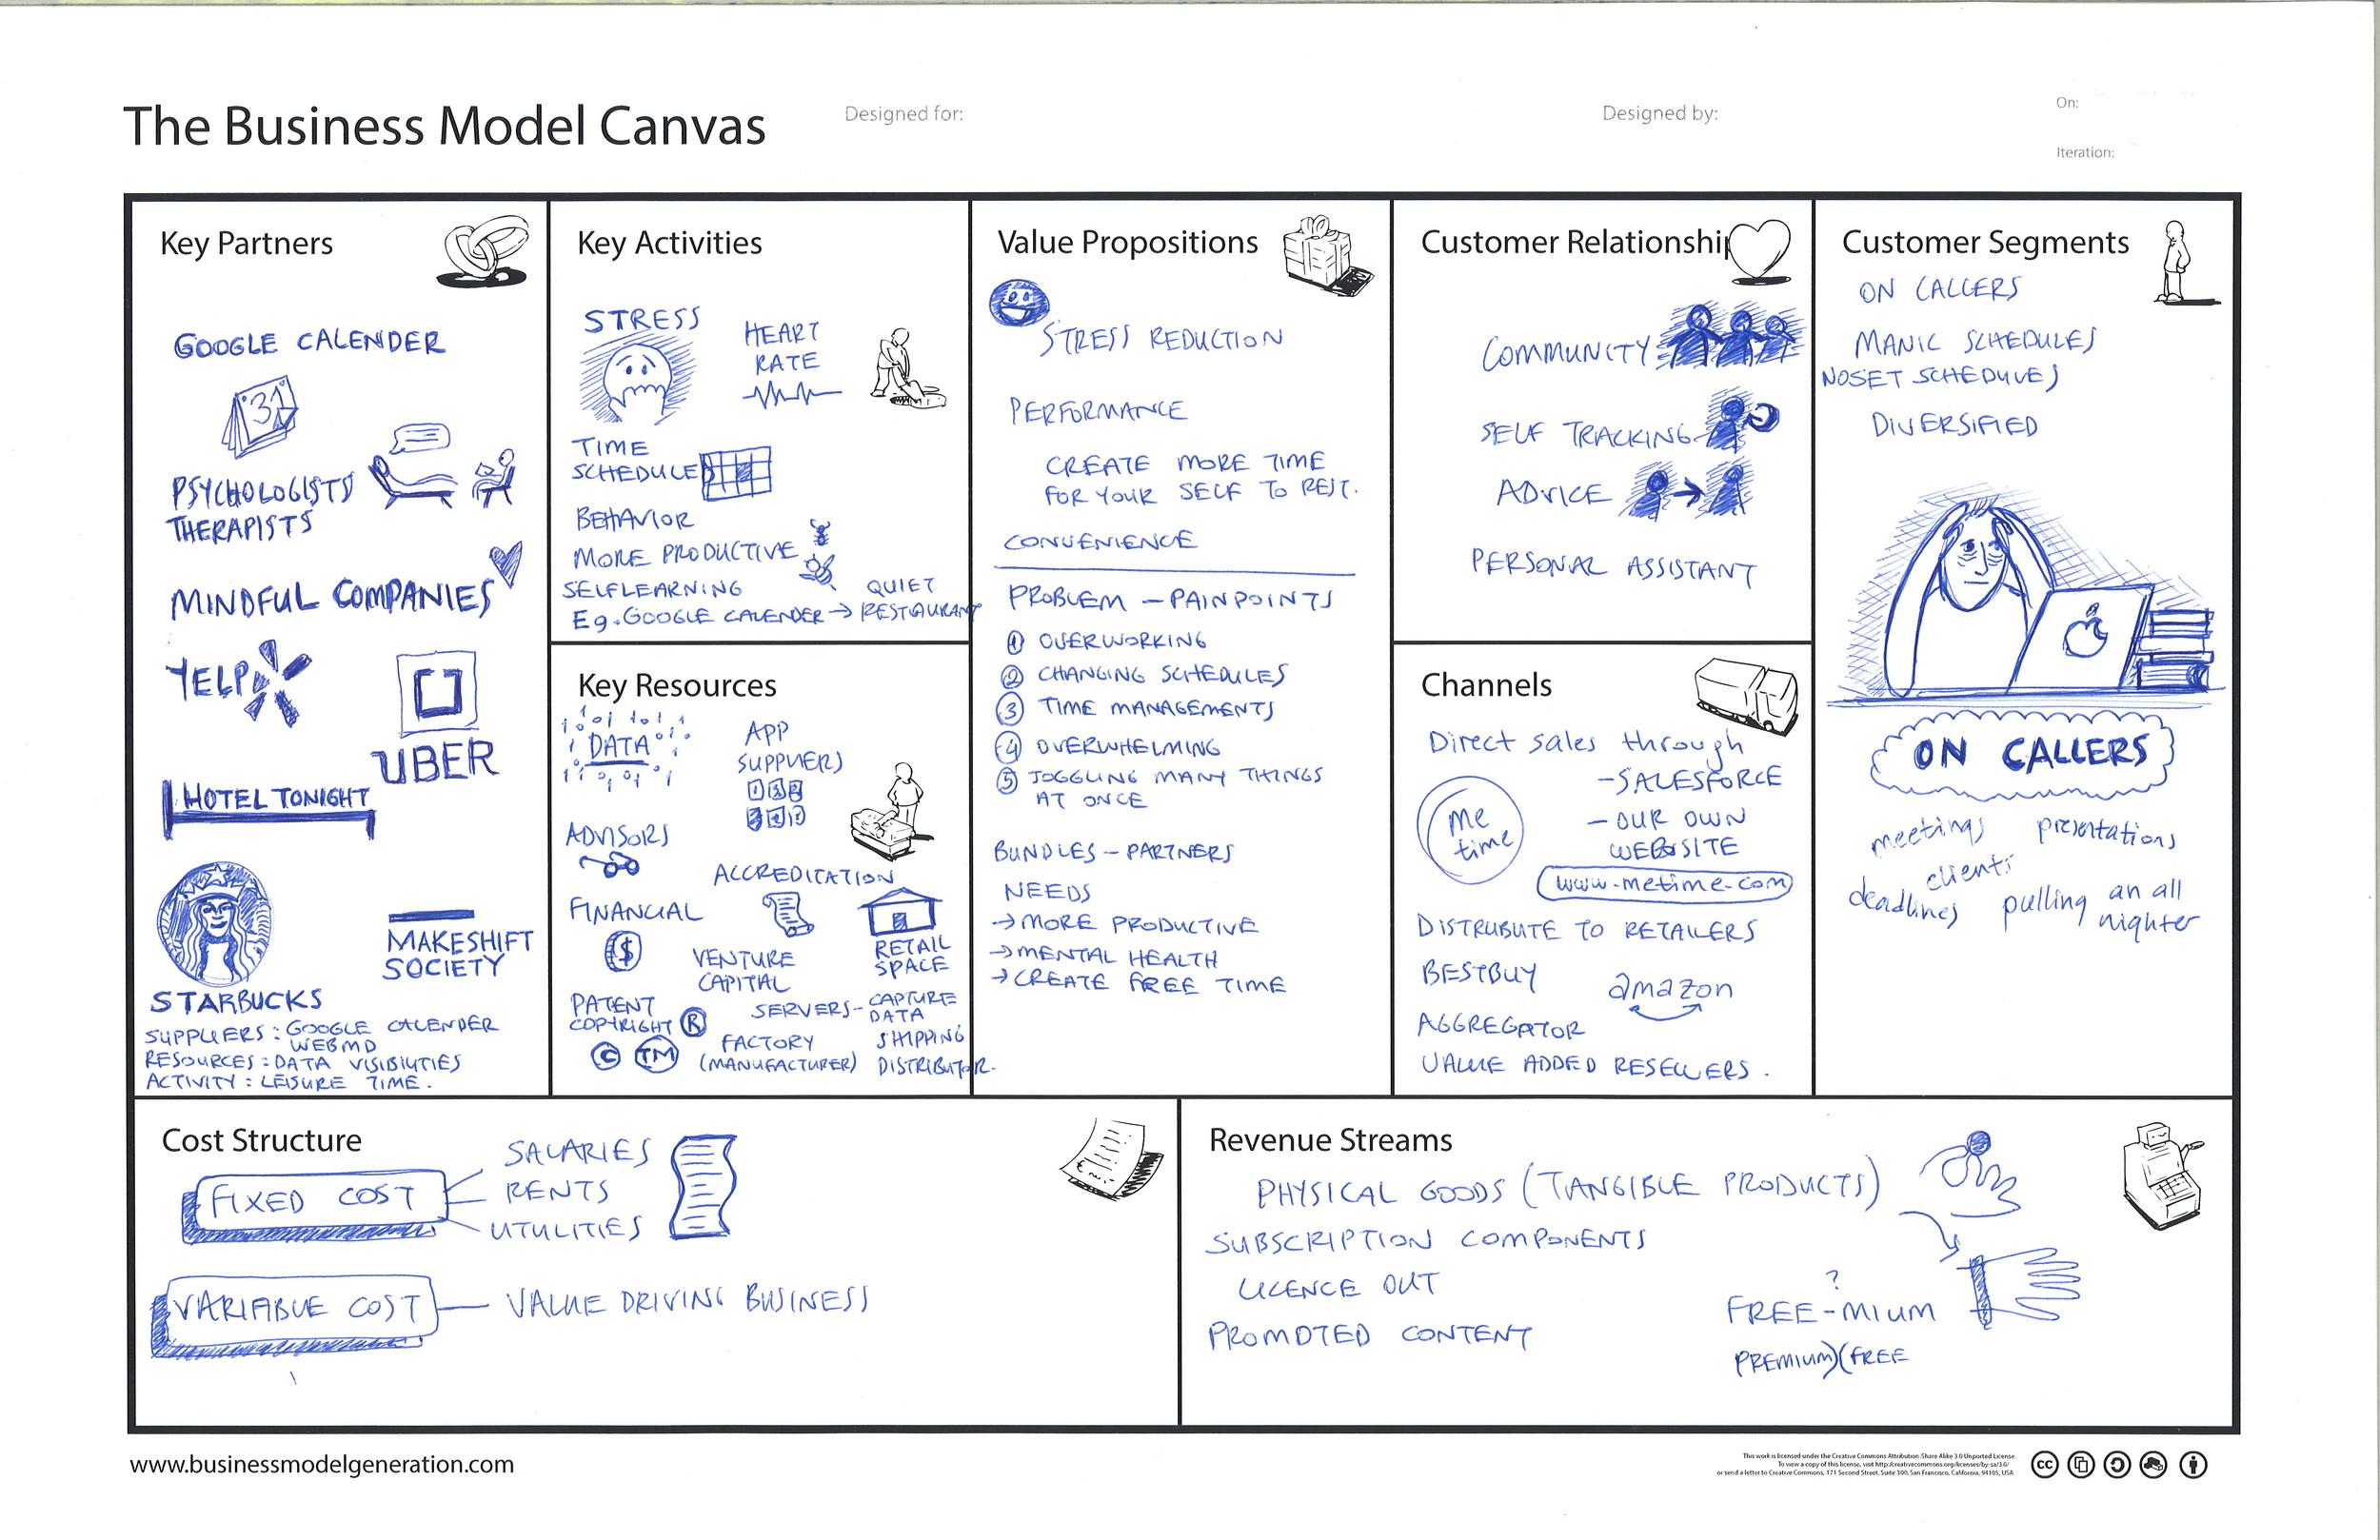 metime_original business model canvas.jpg